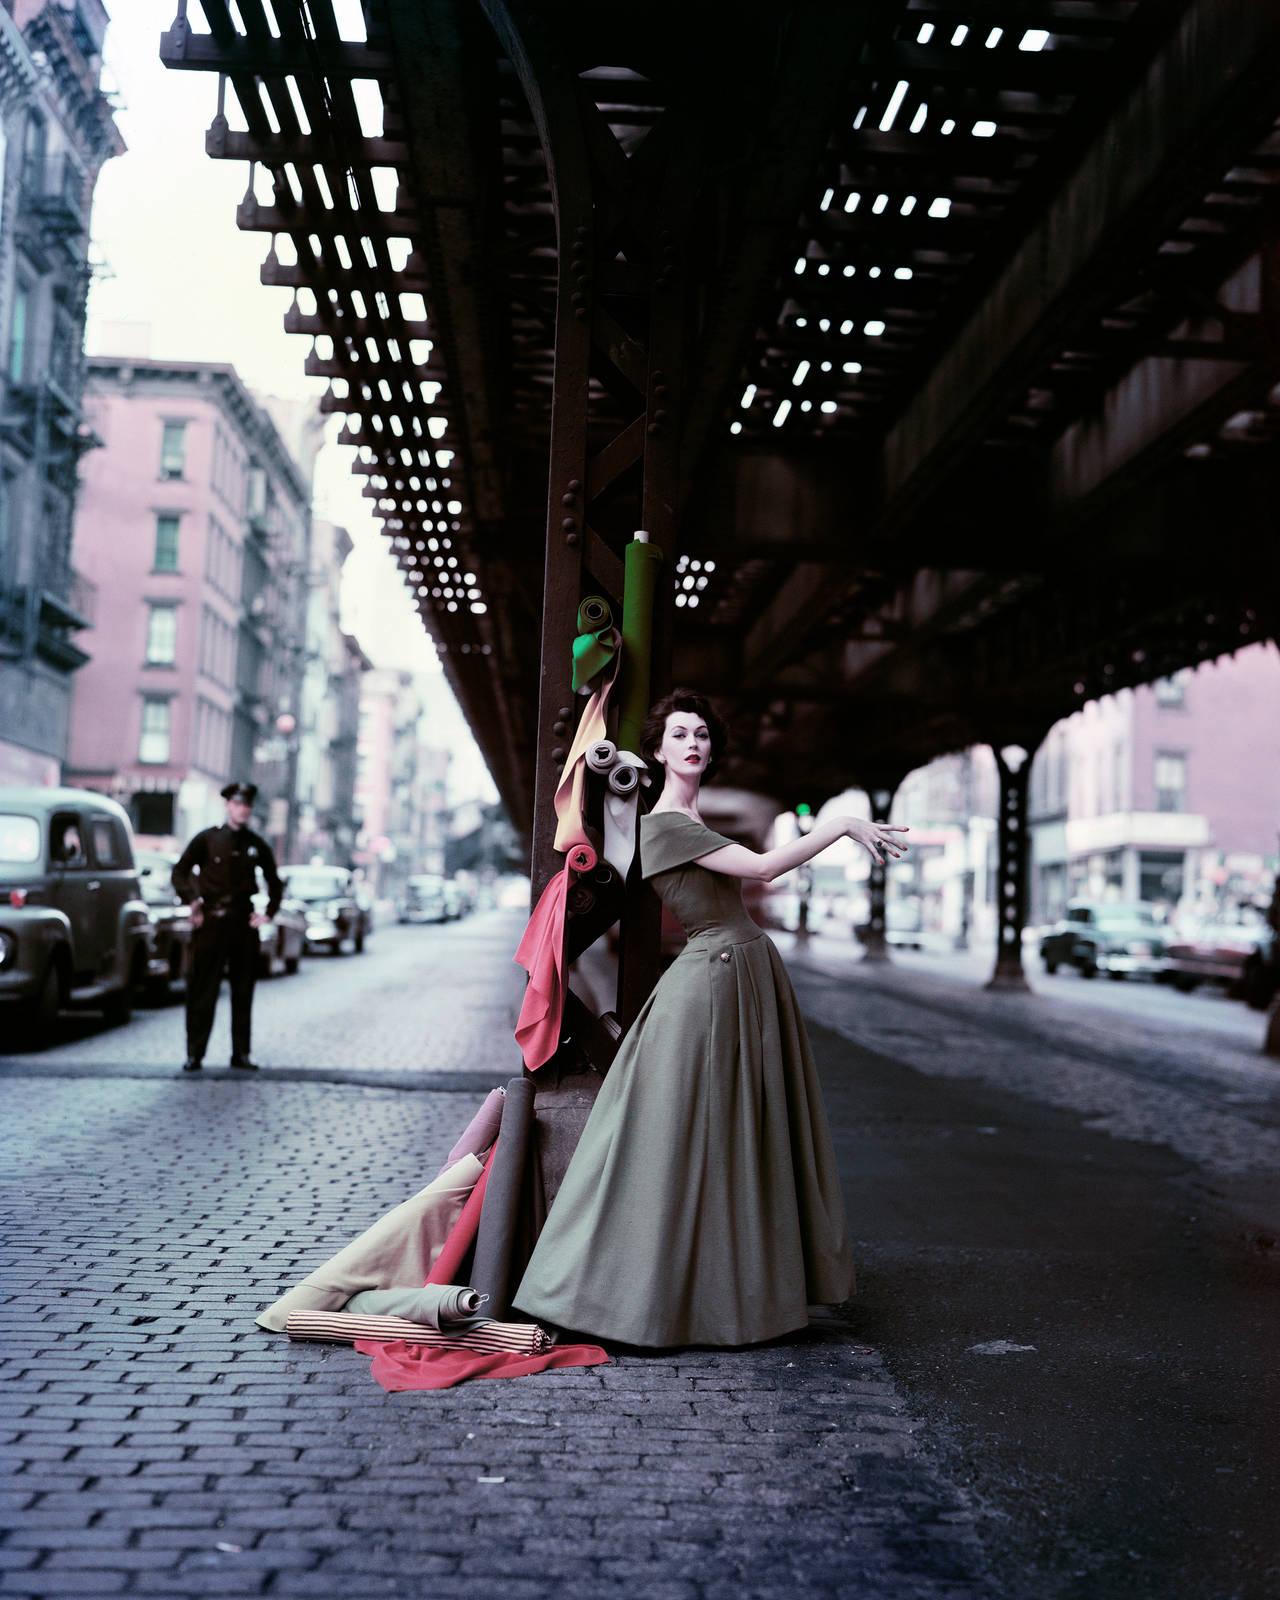 William Helburn - Dovima Under the El - Dior Creates Cosmopolitan Drama 1